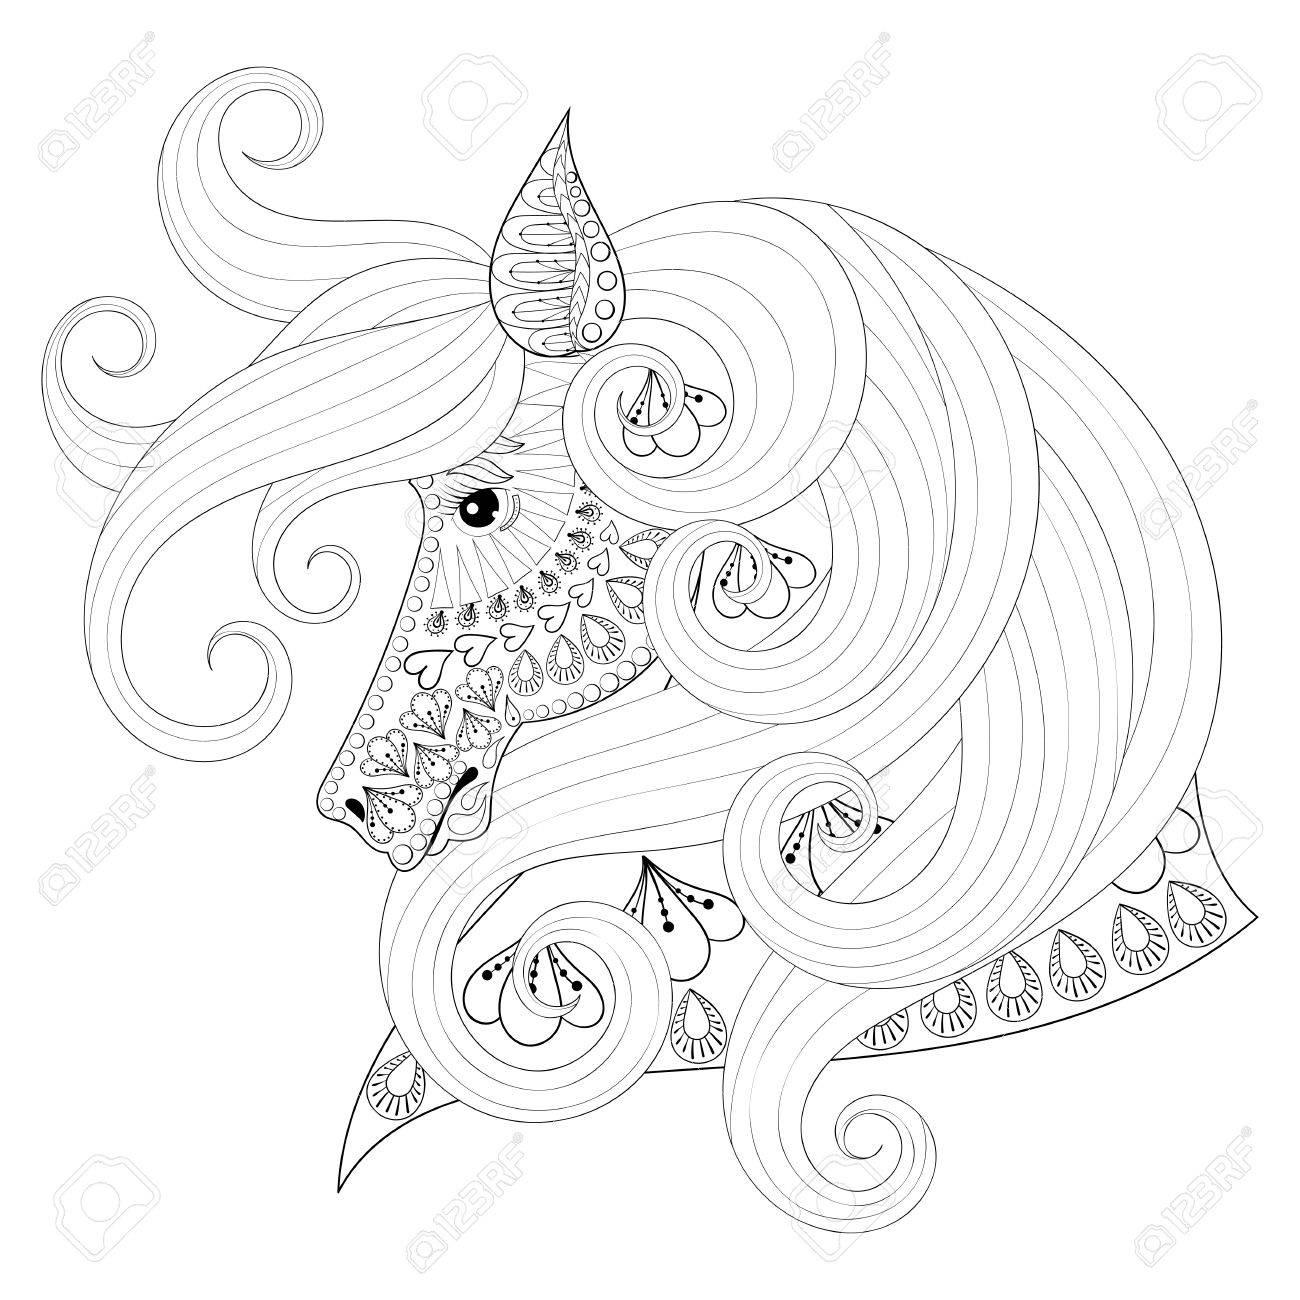 Dibujado A Mano Ornamental Caballo Para Colorear Páginas Para ...